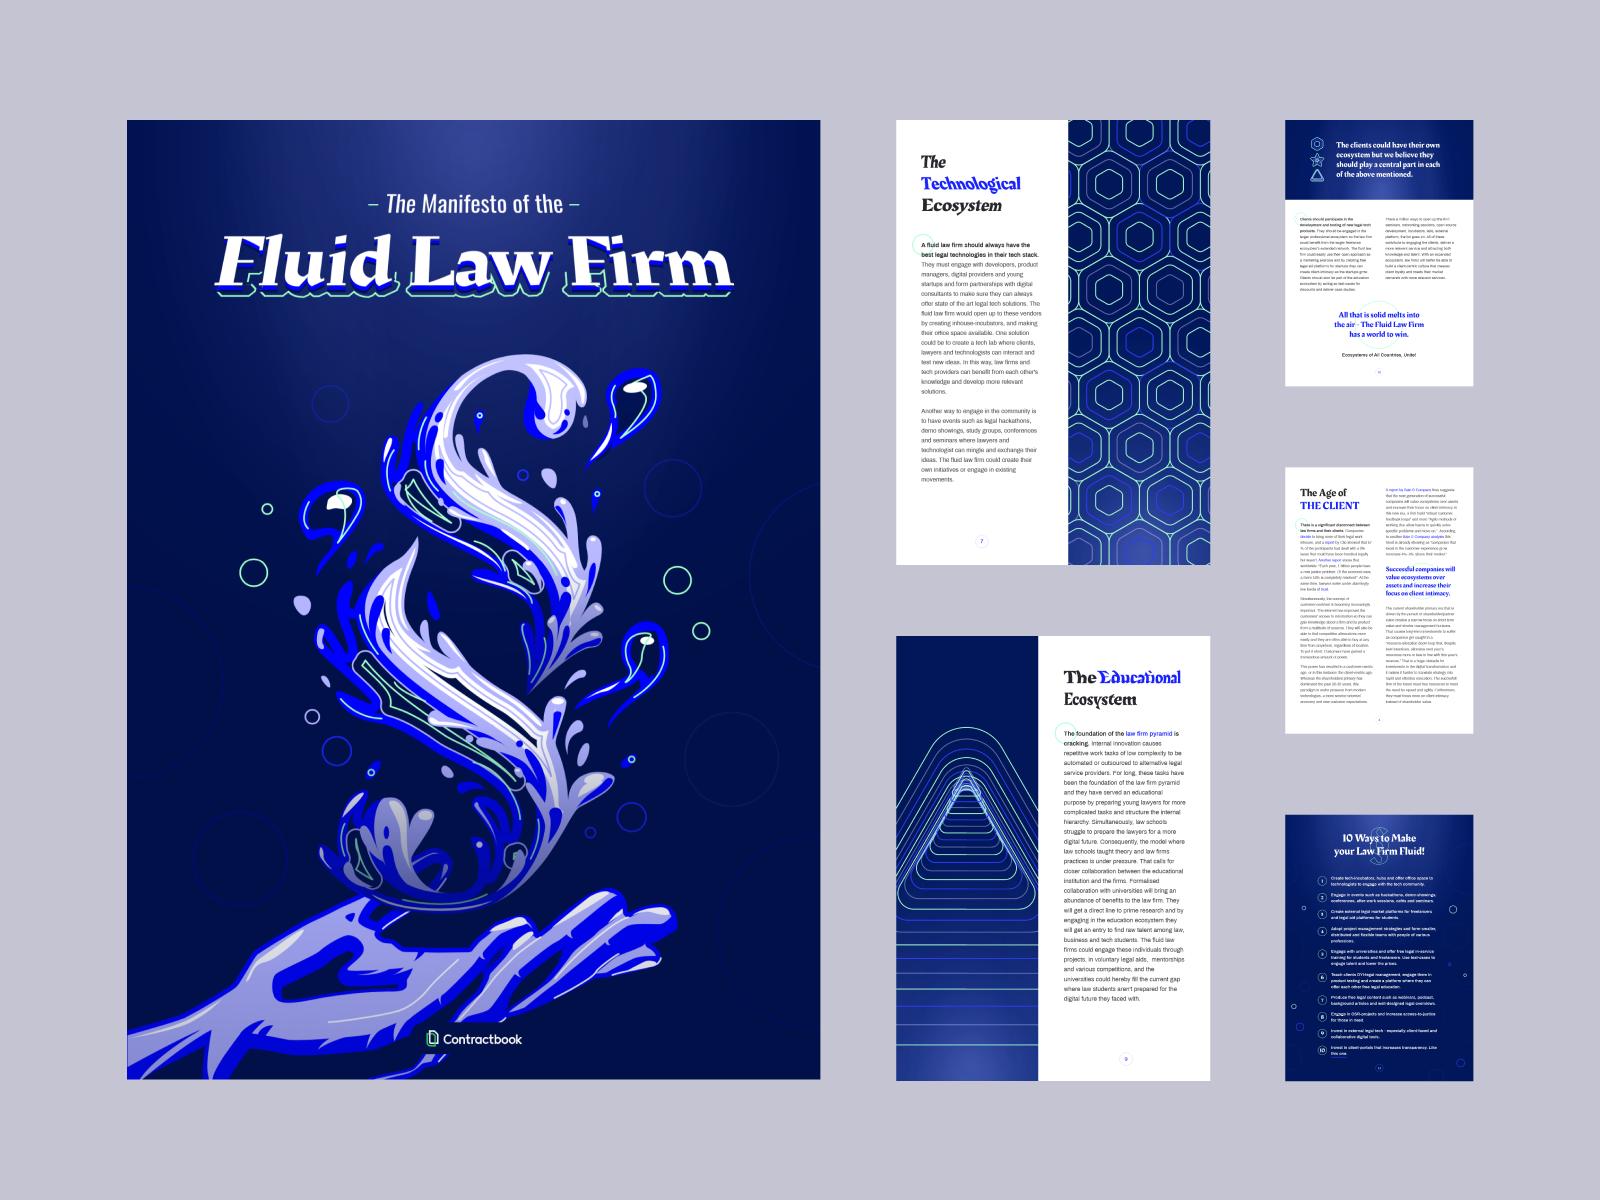 Fluid law firm